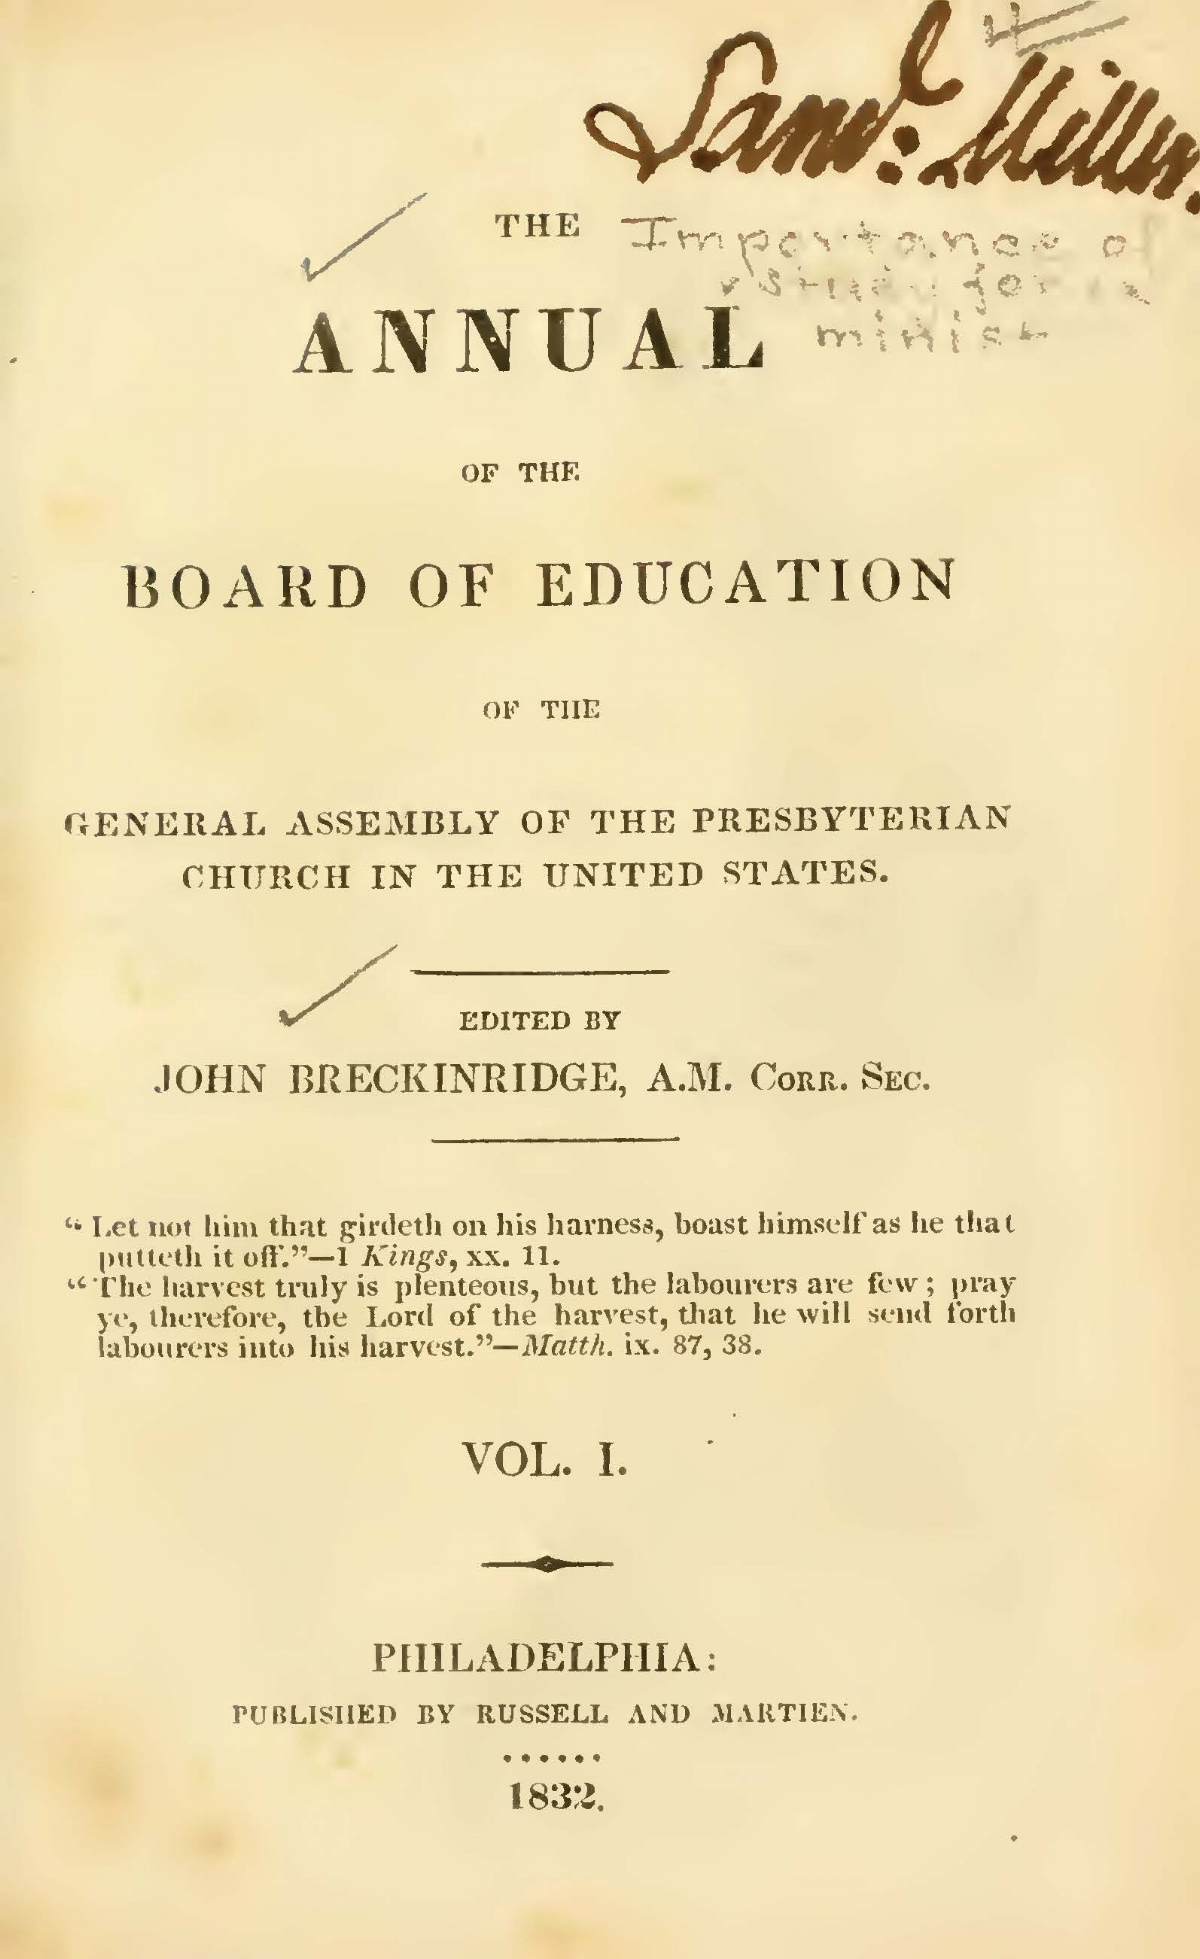 Breckinridge, John, Introductory Address Title Page.jpg